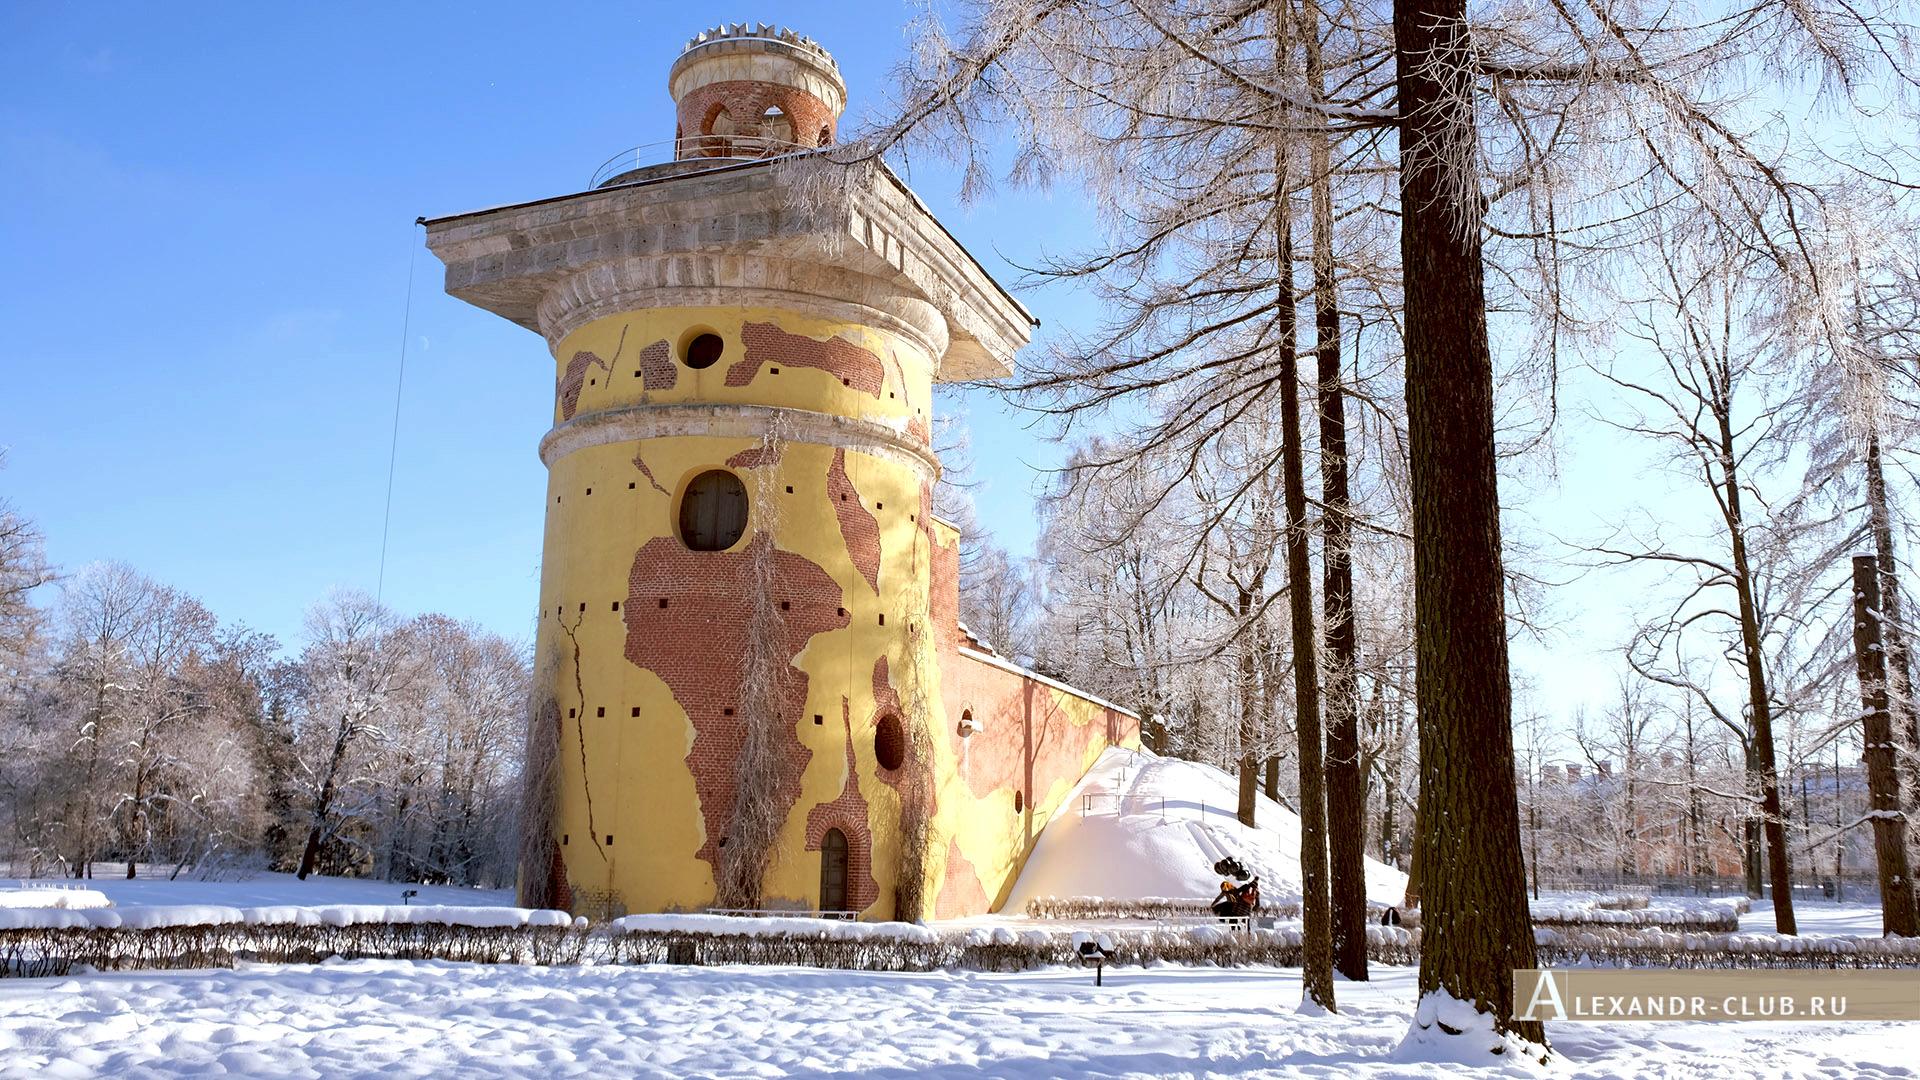 Царское Село, зима, Екатерининский парк, Башня-руина